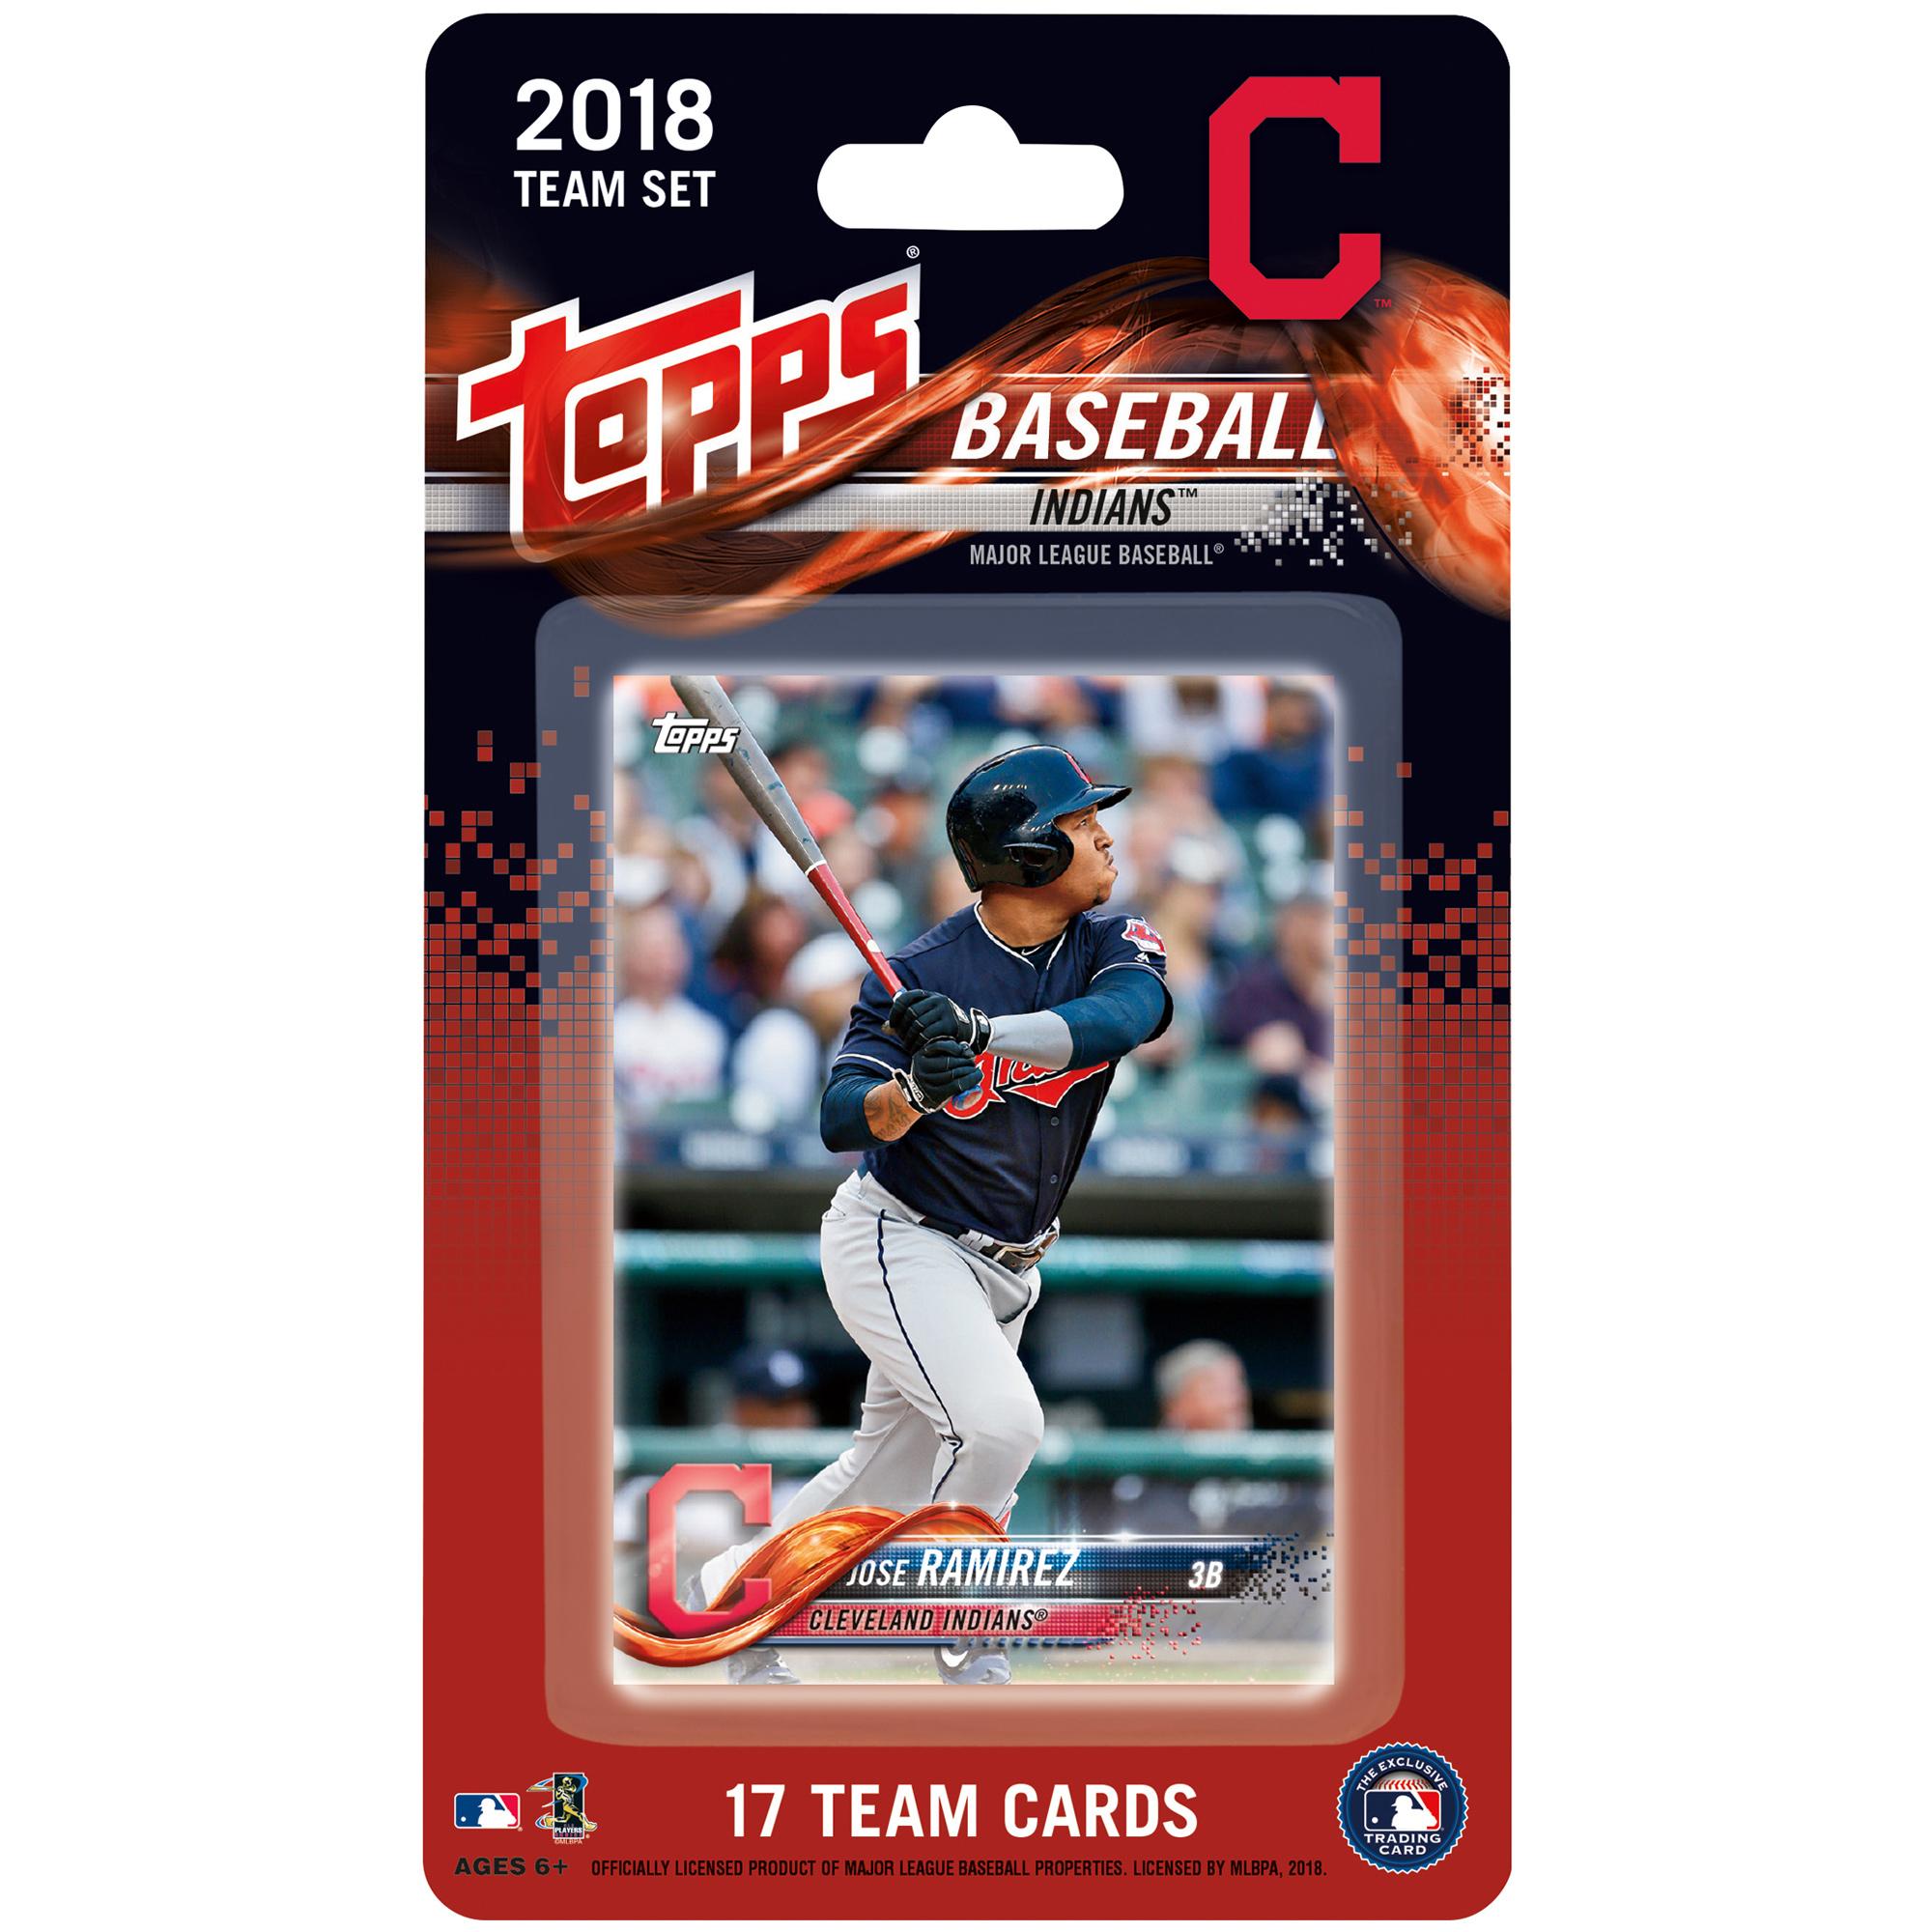 Cleveland Indians 2018 Team Set Trading Cards - No Size